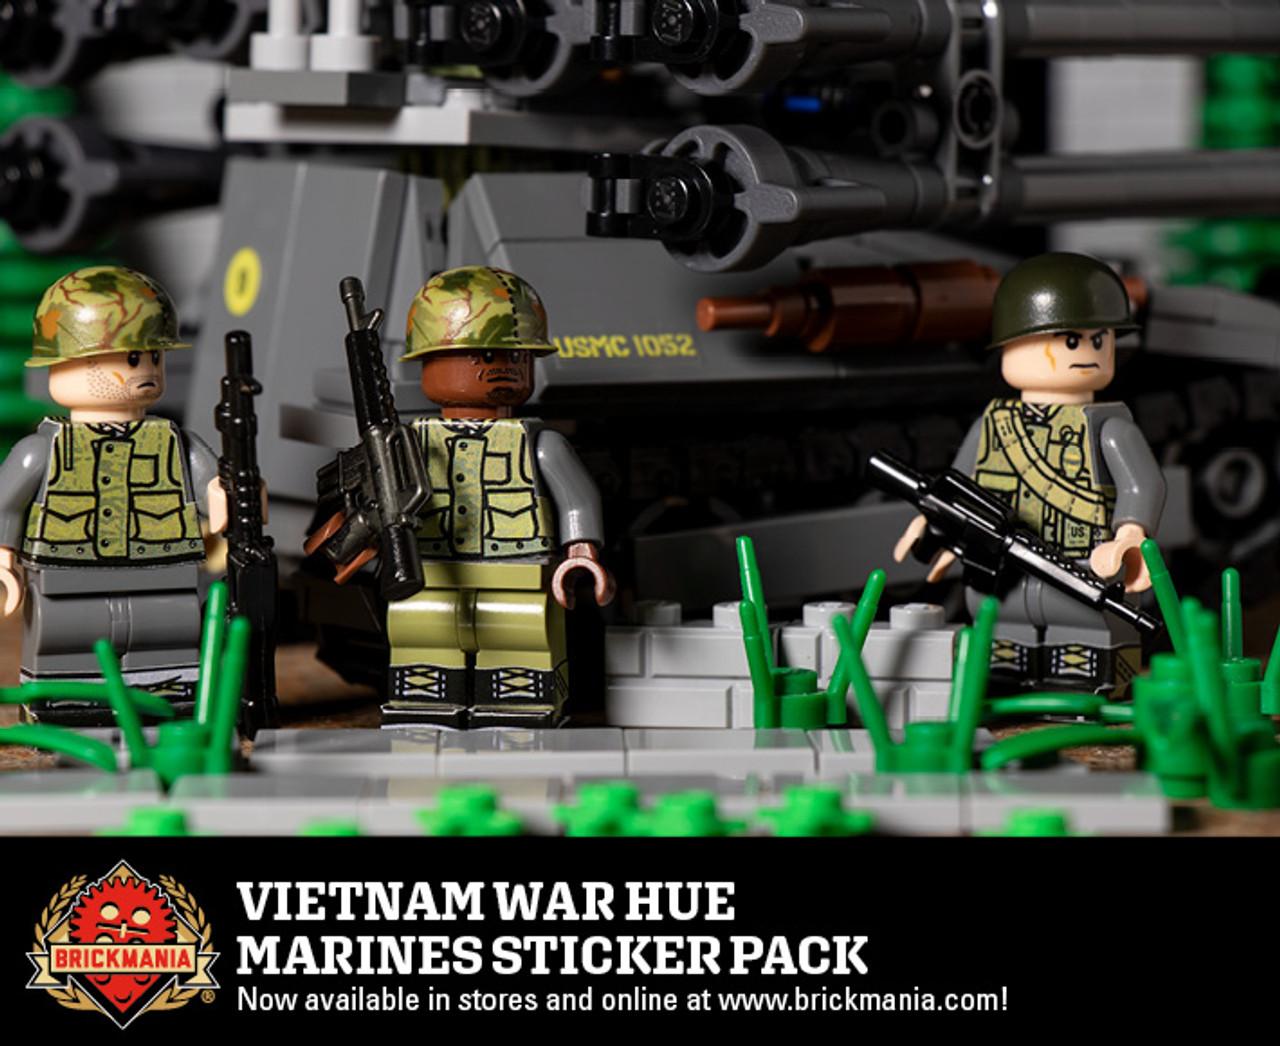 Vietnam War Hue Marines Sticker Pack